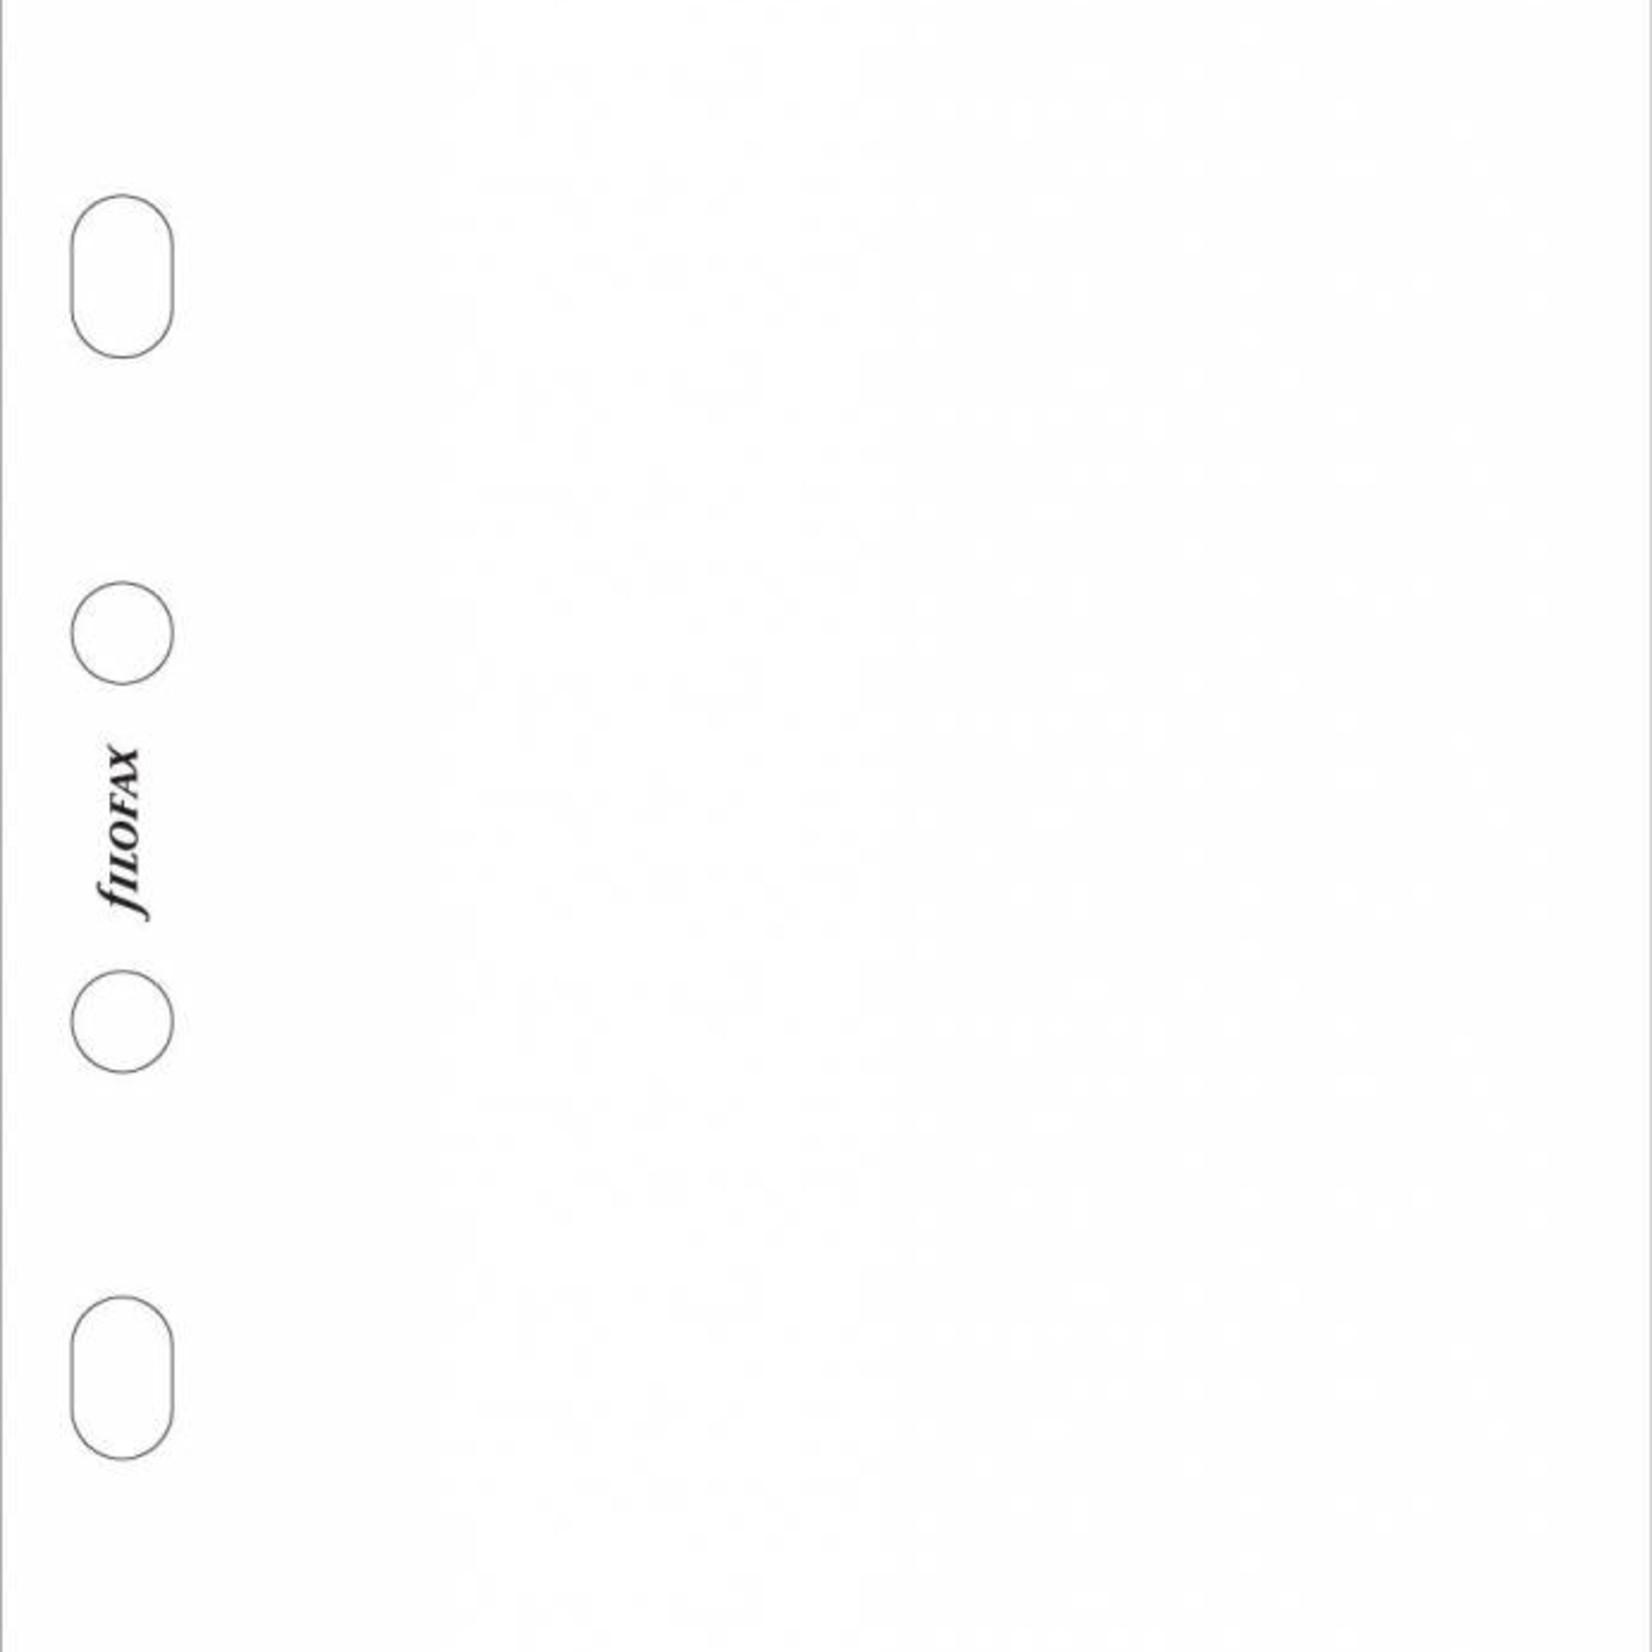 Filofax Filofax Einlage Pocket, Papier blanko, weiß